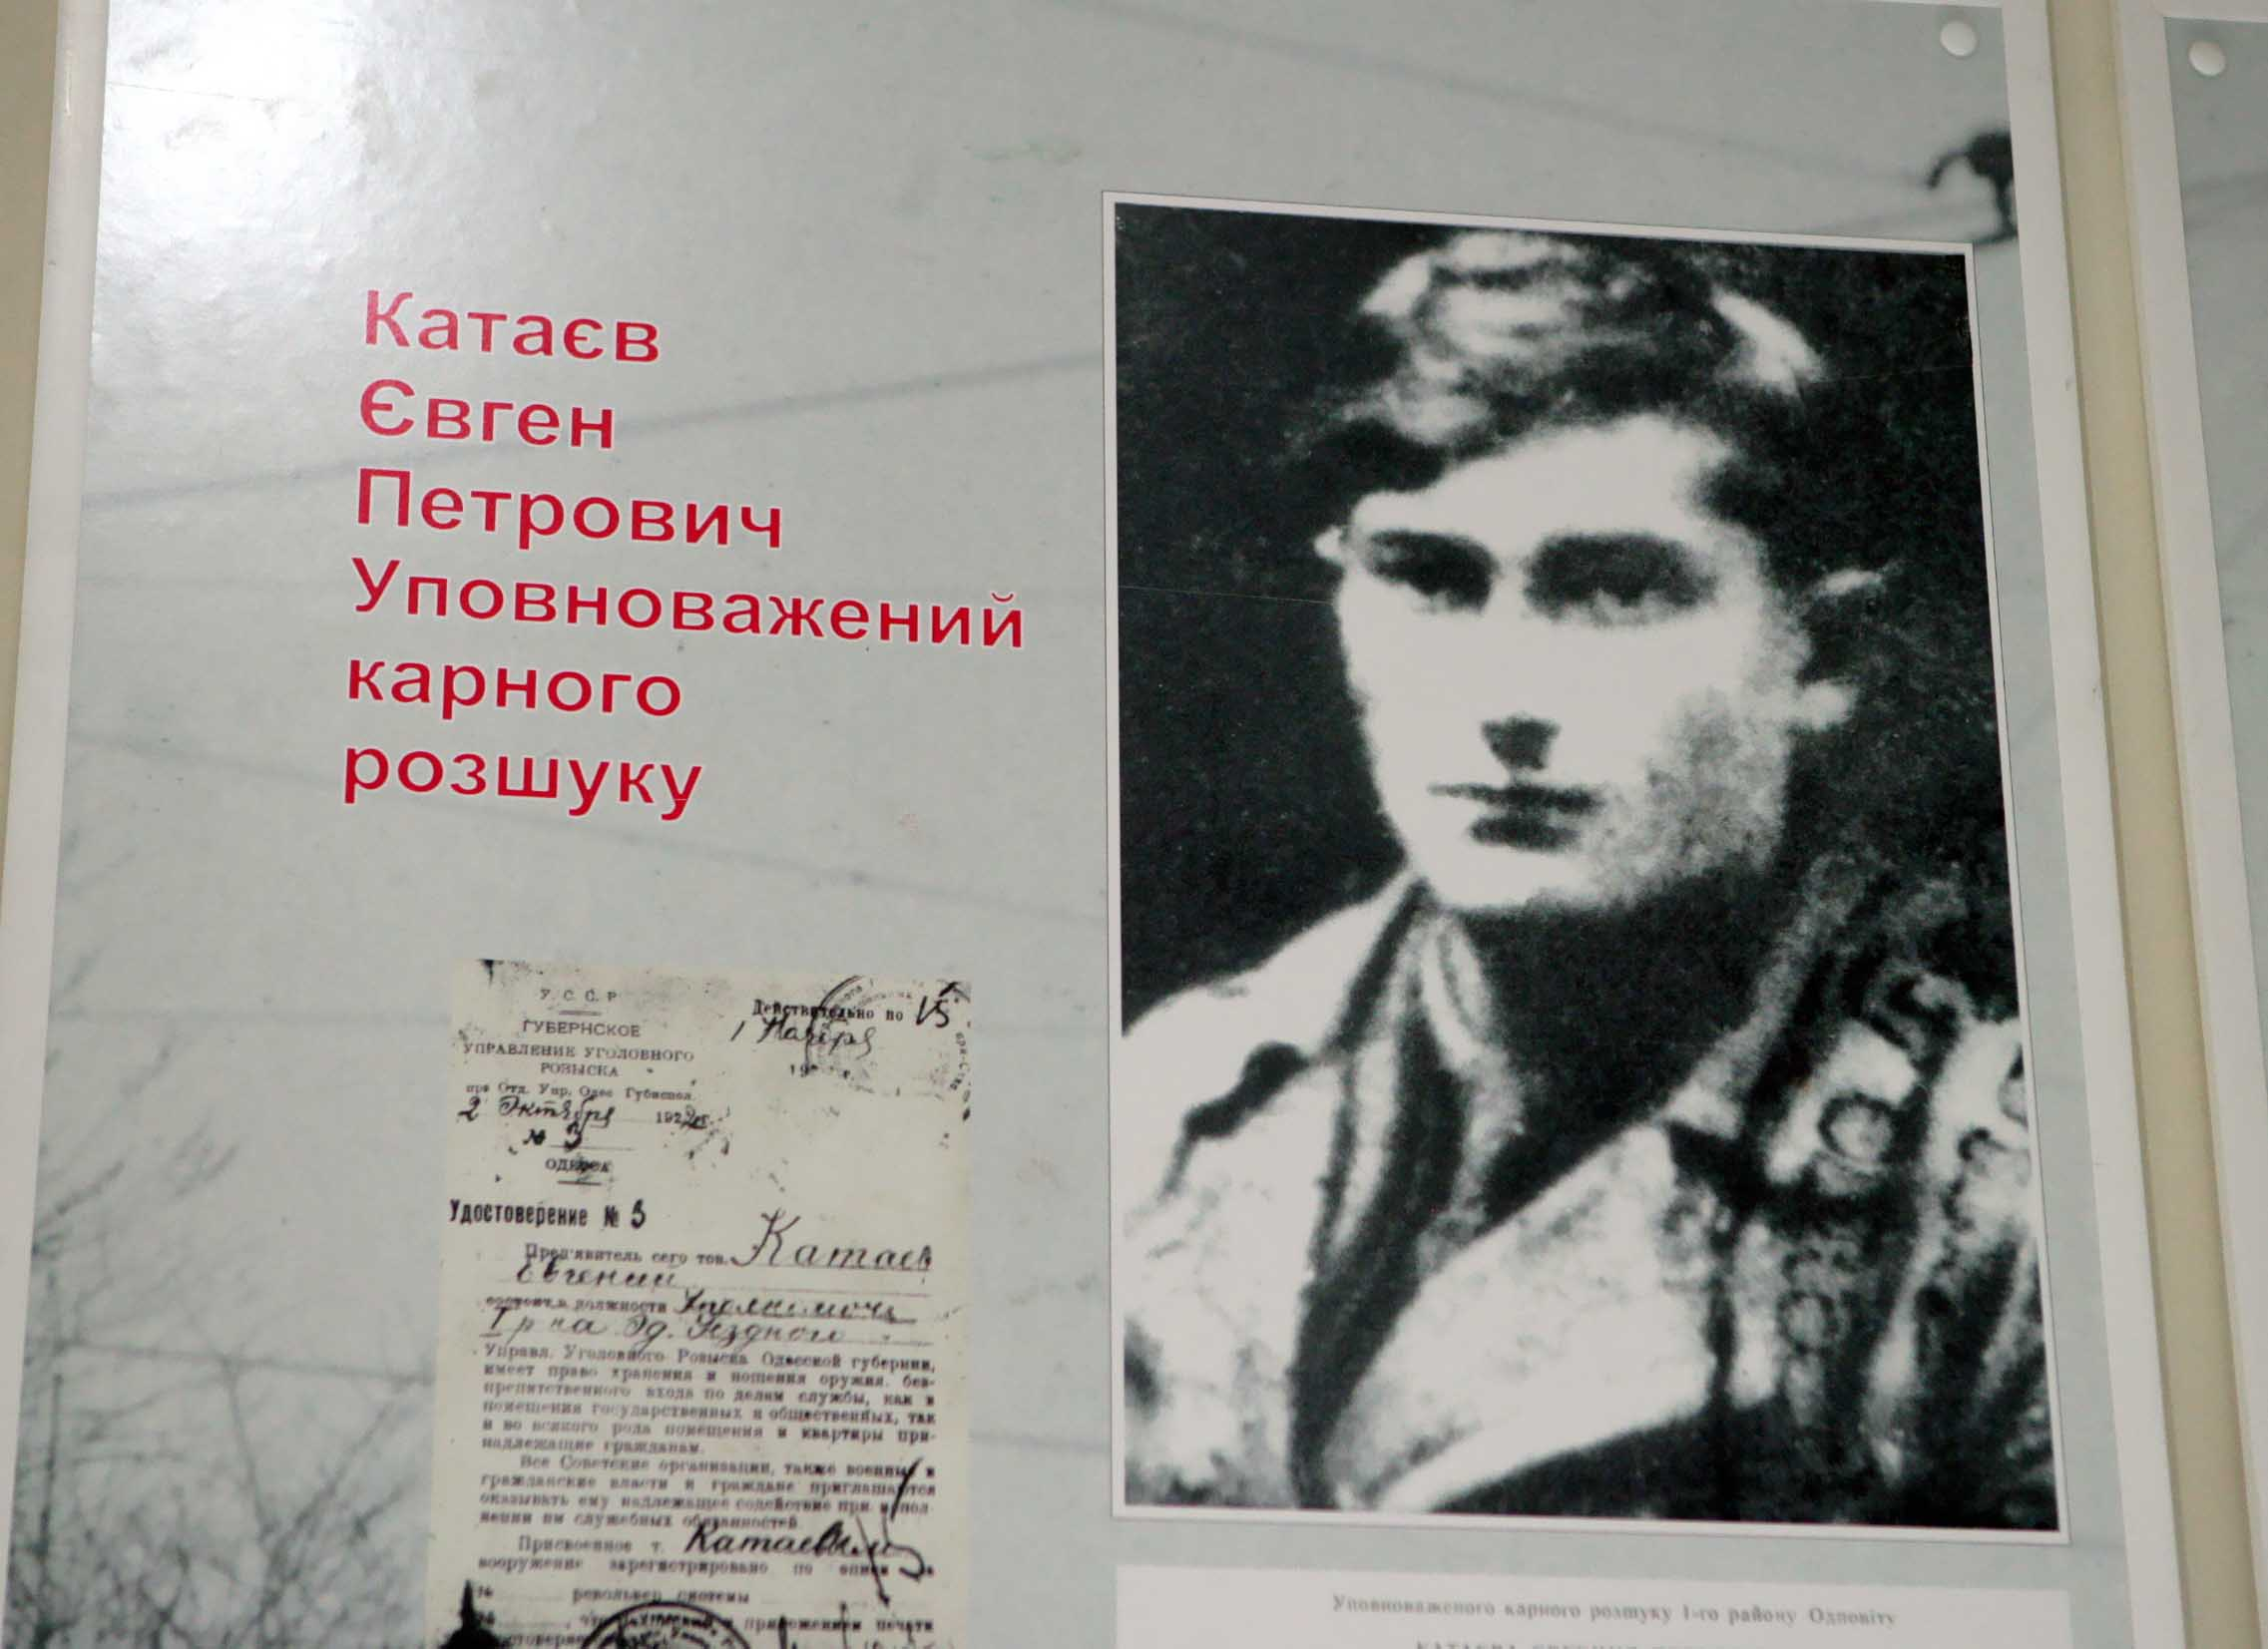 Стенд сотрудника уголовного розыска писателя Евгения Катаева